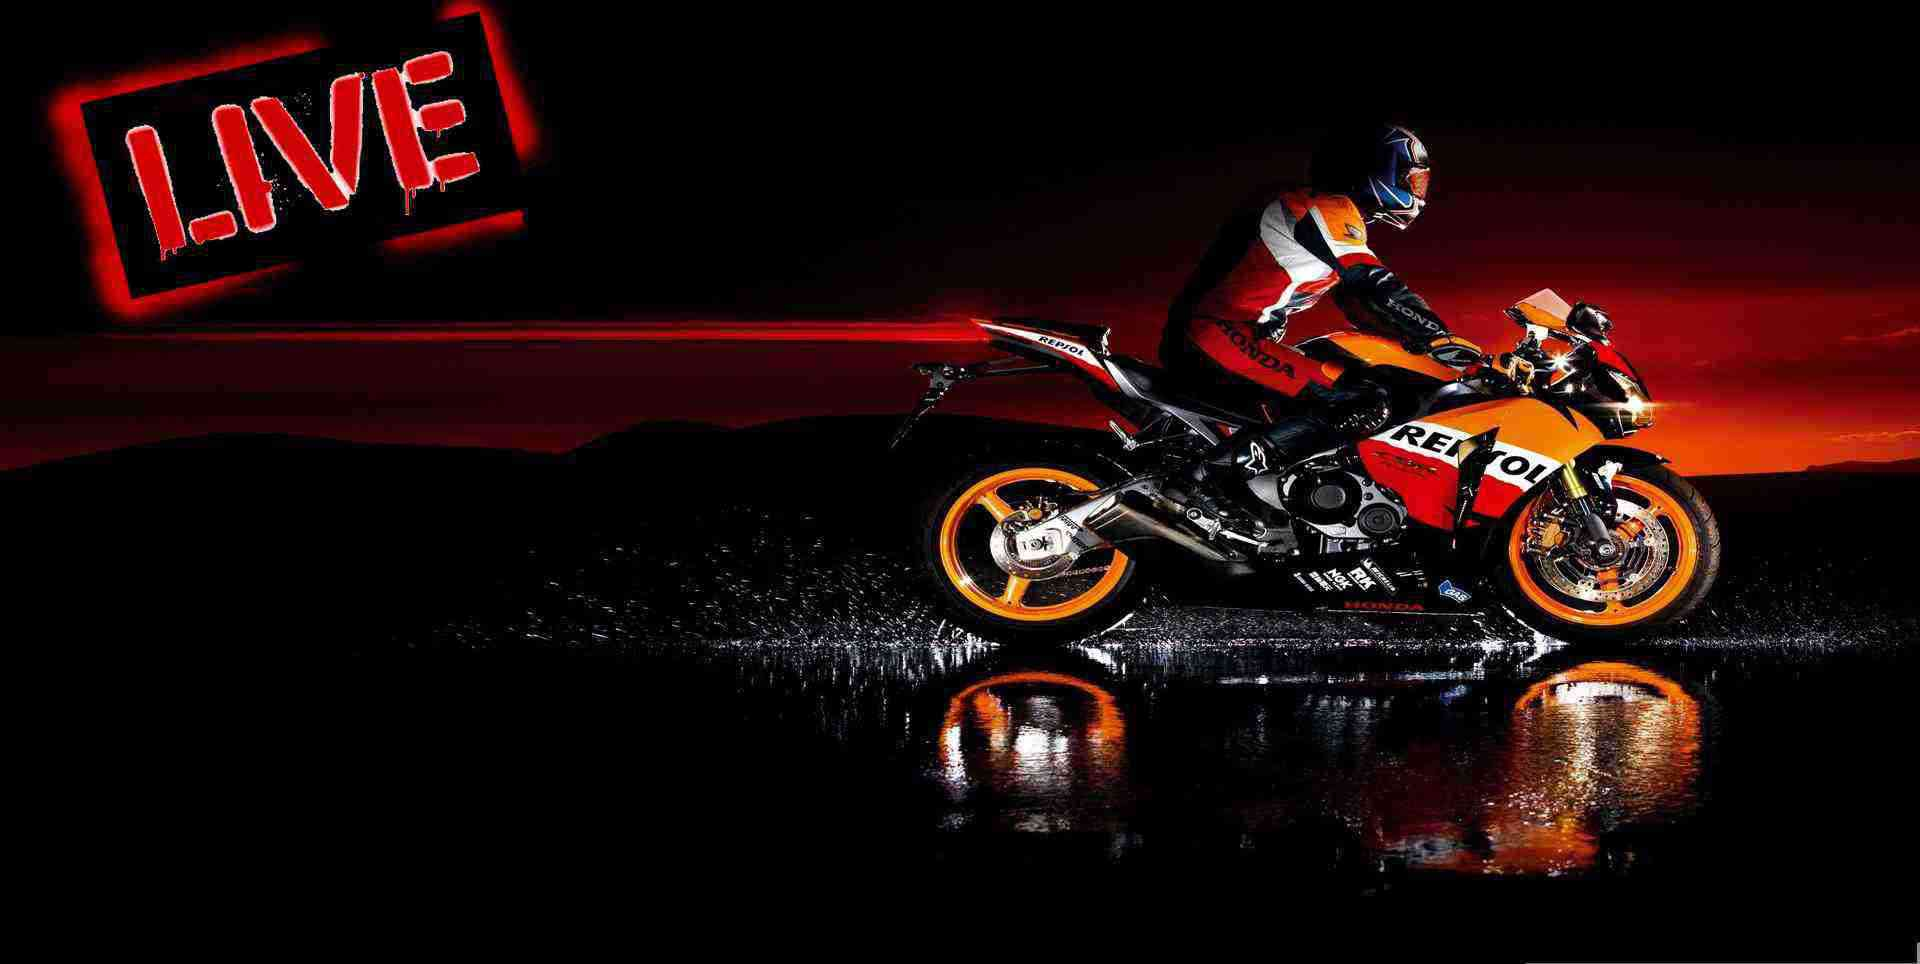 pirelli-malaysian-sbk-racing-2015-online